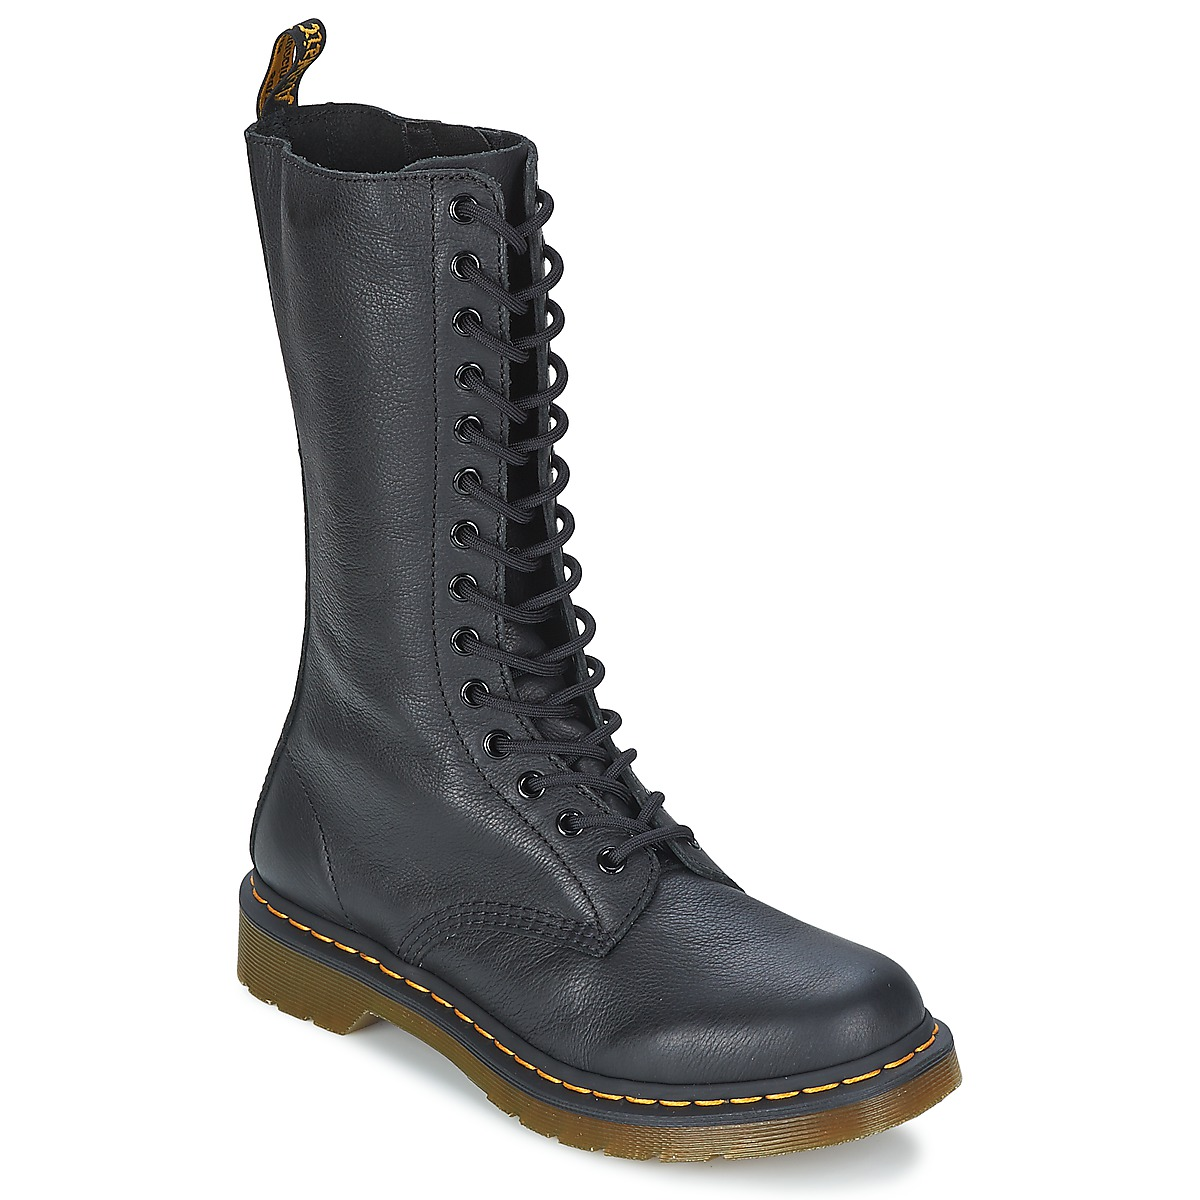 Dr Martens 1B99 Schwarz - Kostenloser Versand bei Spartoode ! - Schuhe Boots Damen 156,00 €